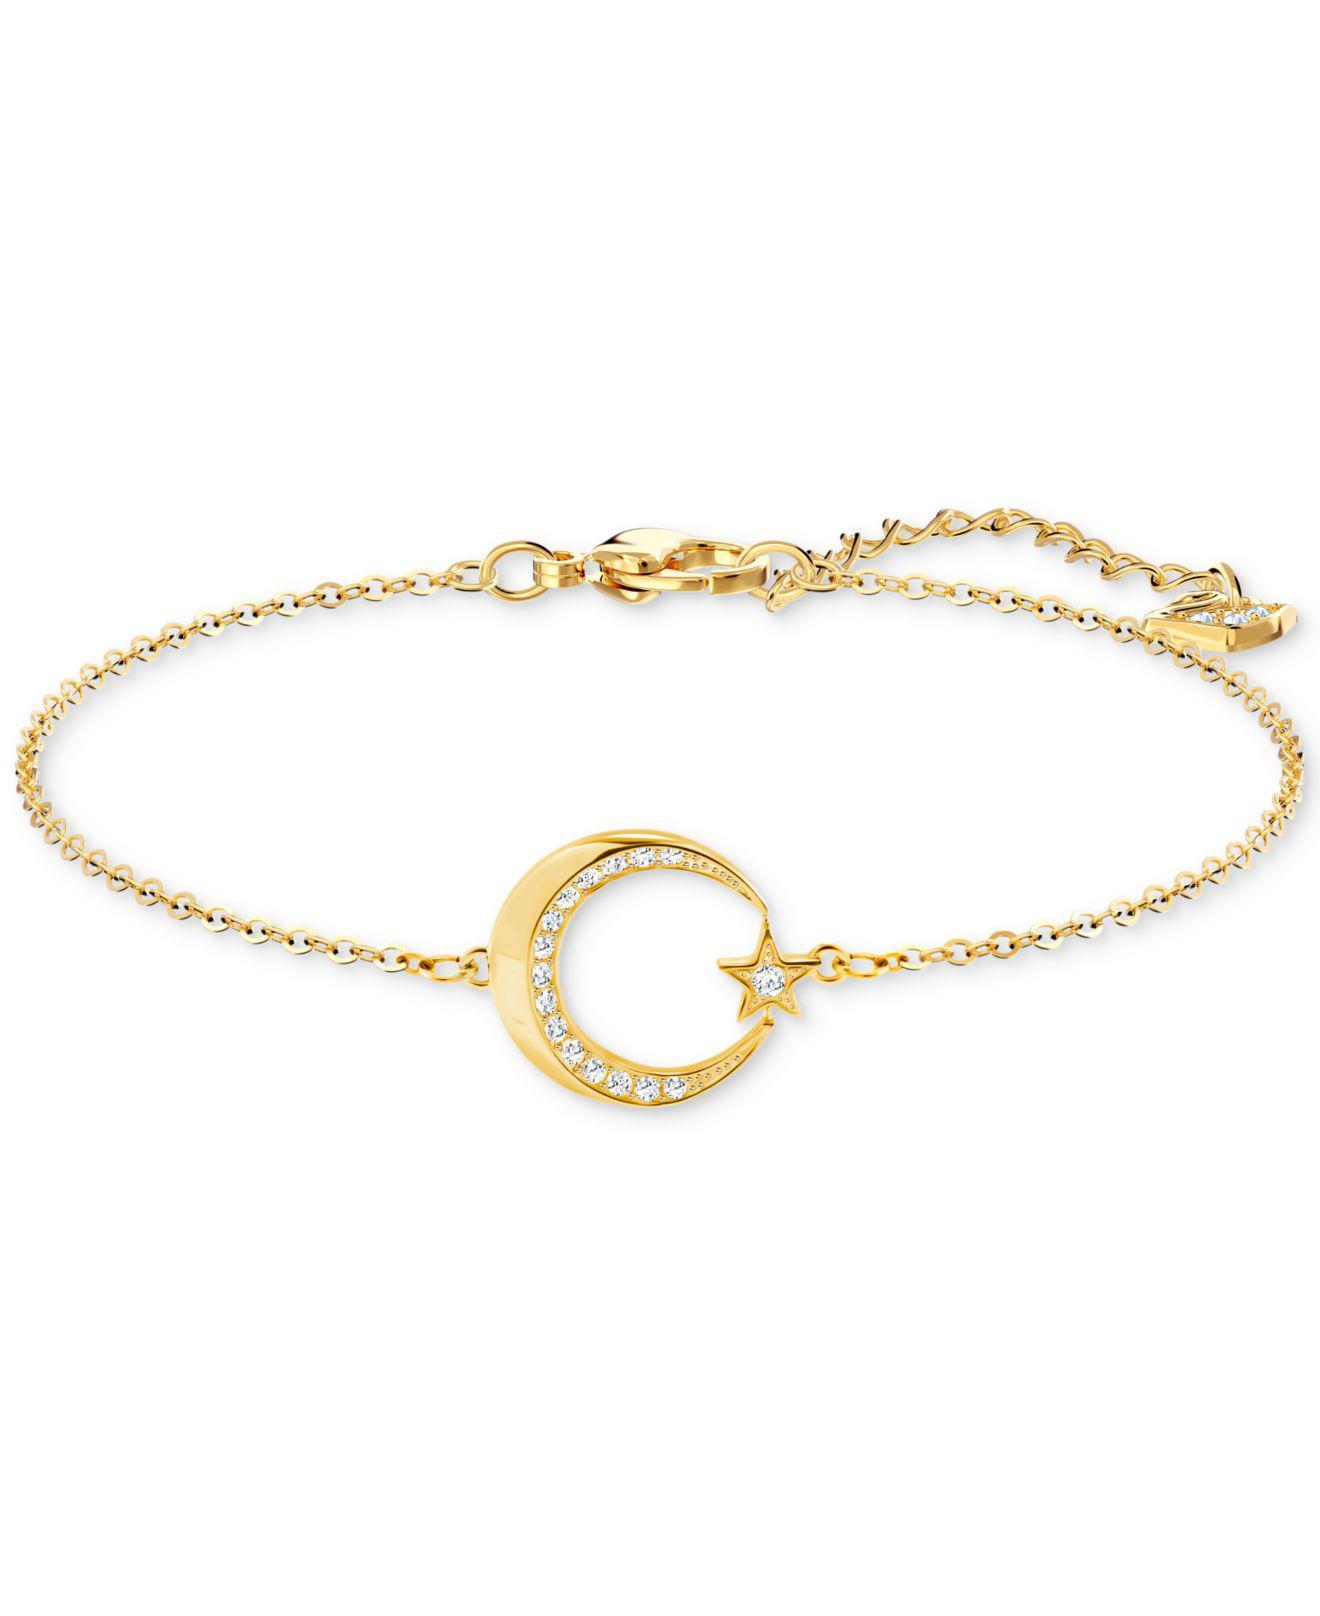 Gold Tone Pavé Crescent Moon Star Link Bracelet